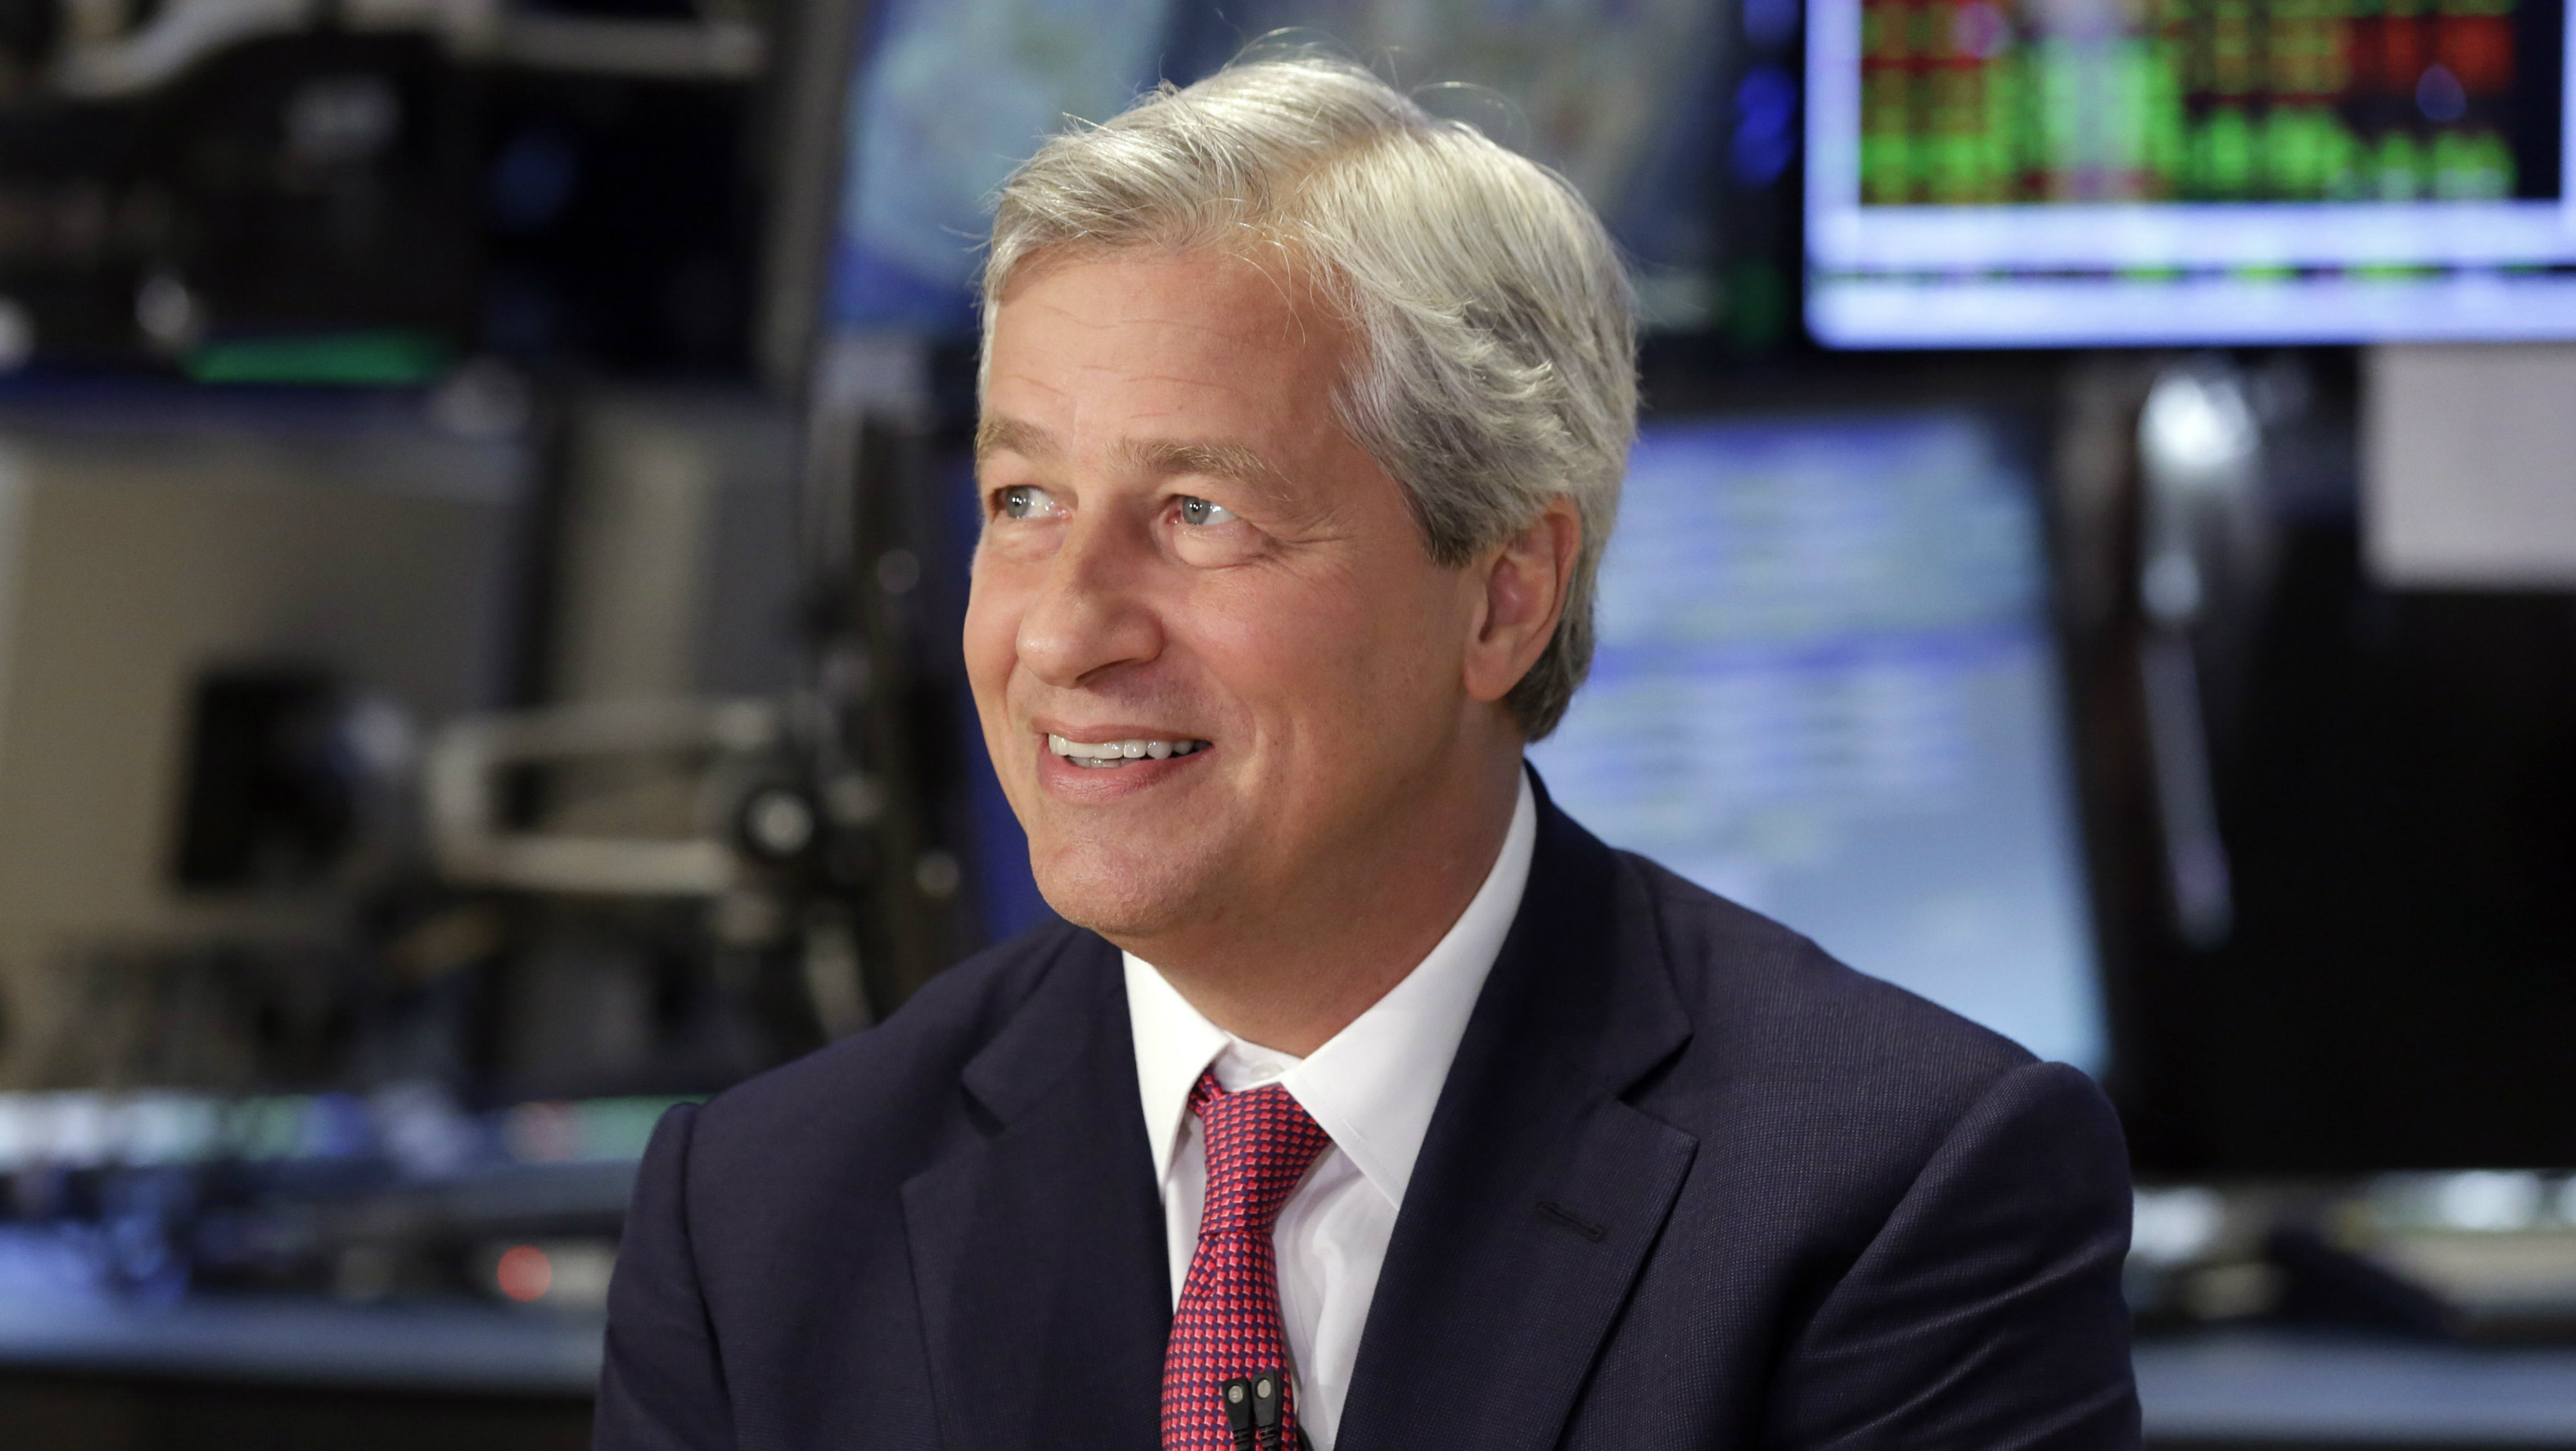 JPMorgan & Chase Co. Chairman and CEO Jamie Dimon